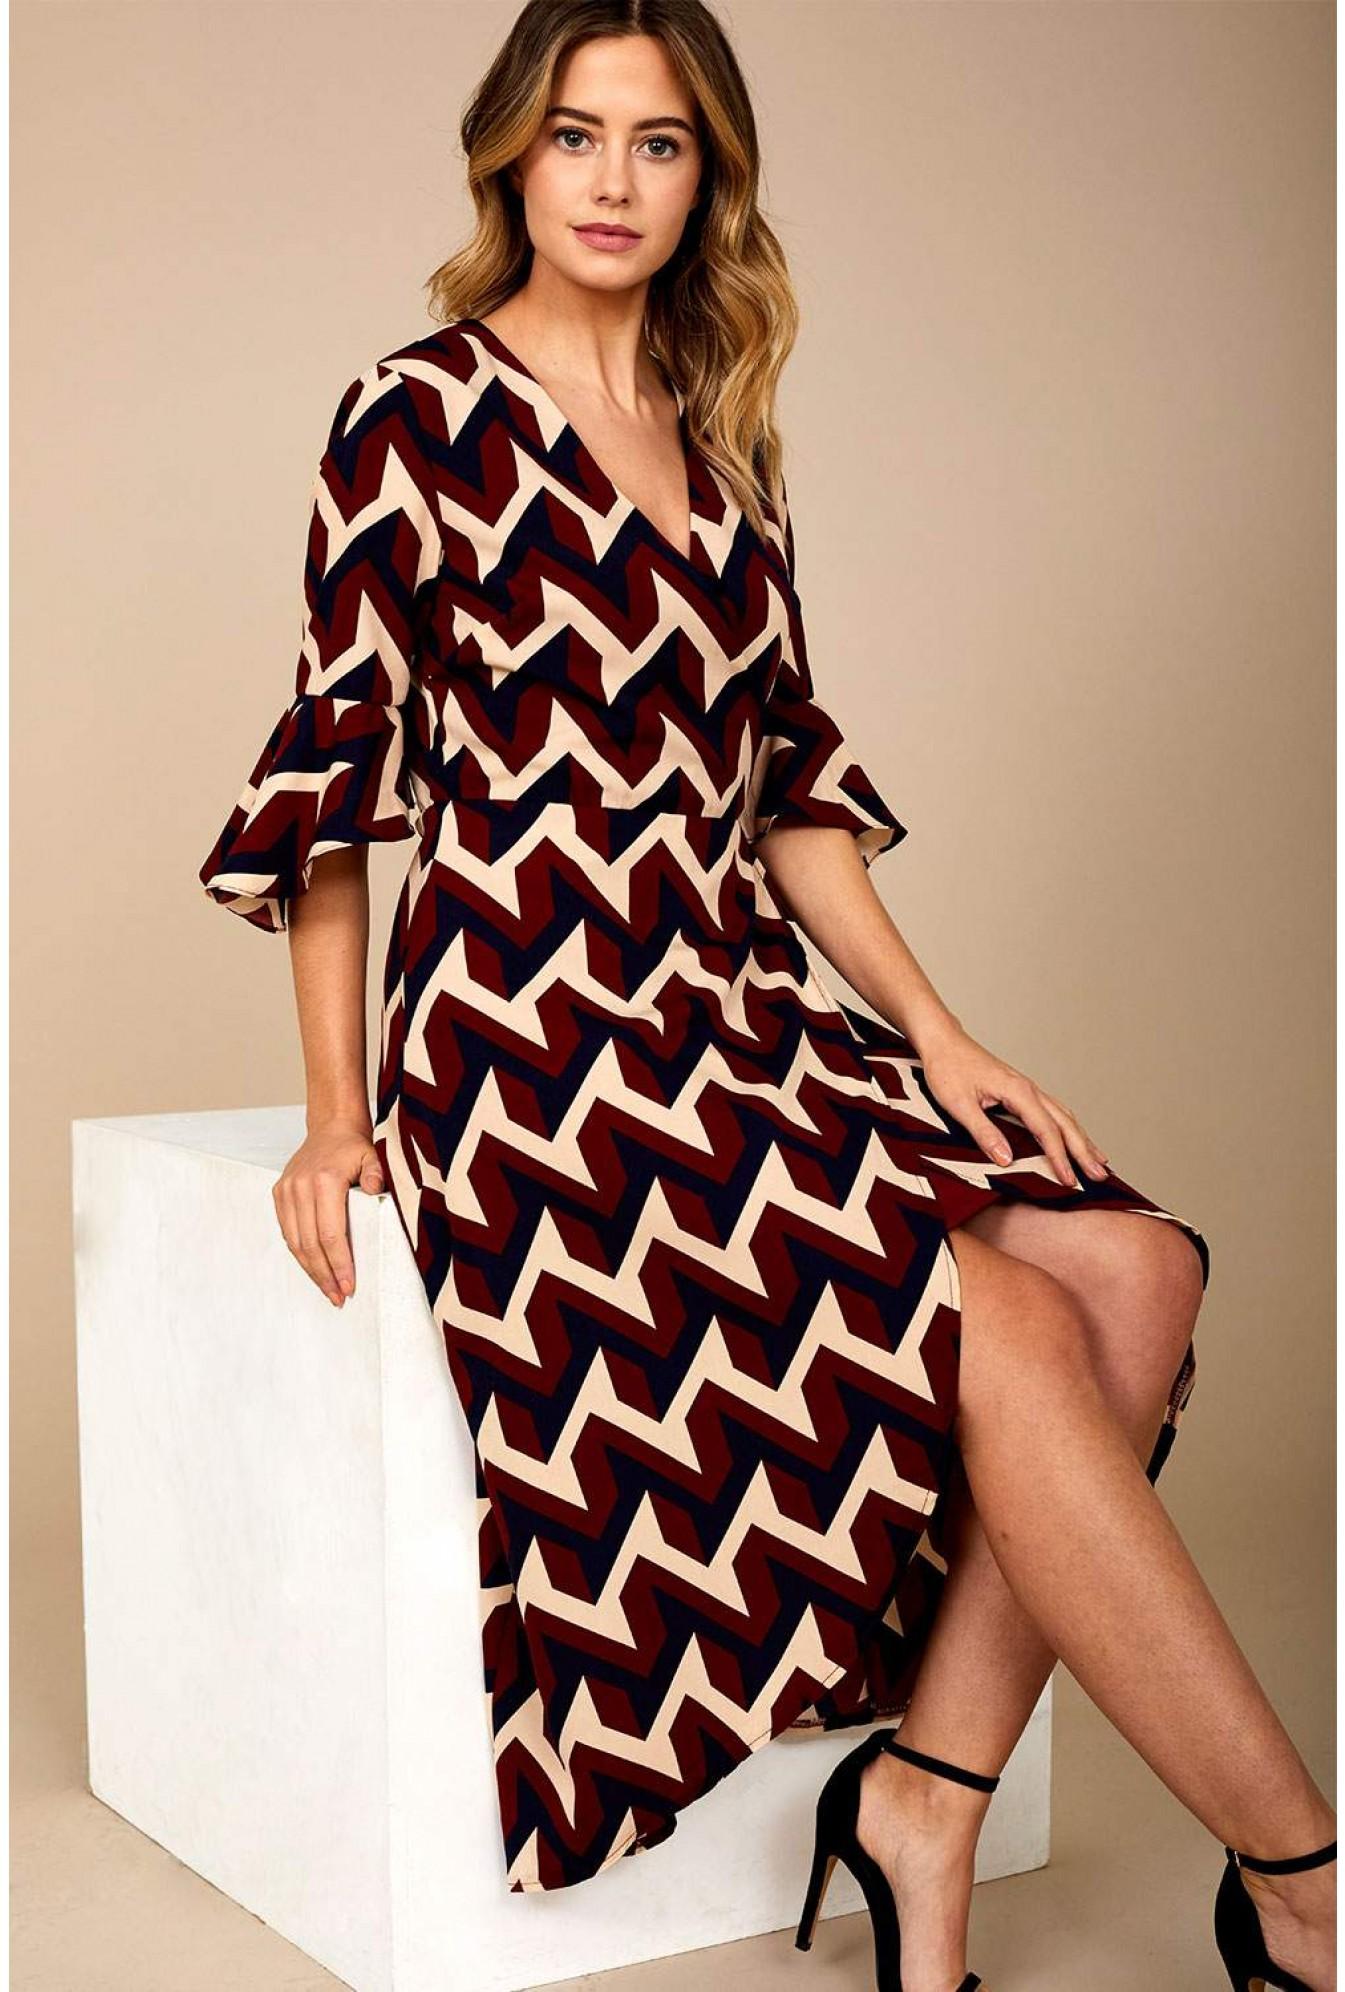 e4610eb0 Marc Angelo Sienna Geometric Print Midi Dress in Wine | iCLOTHING